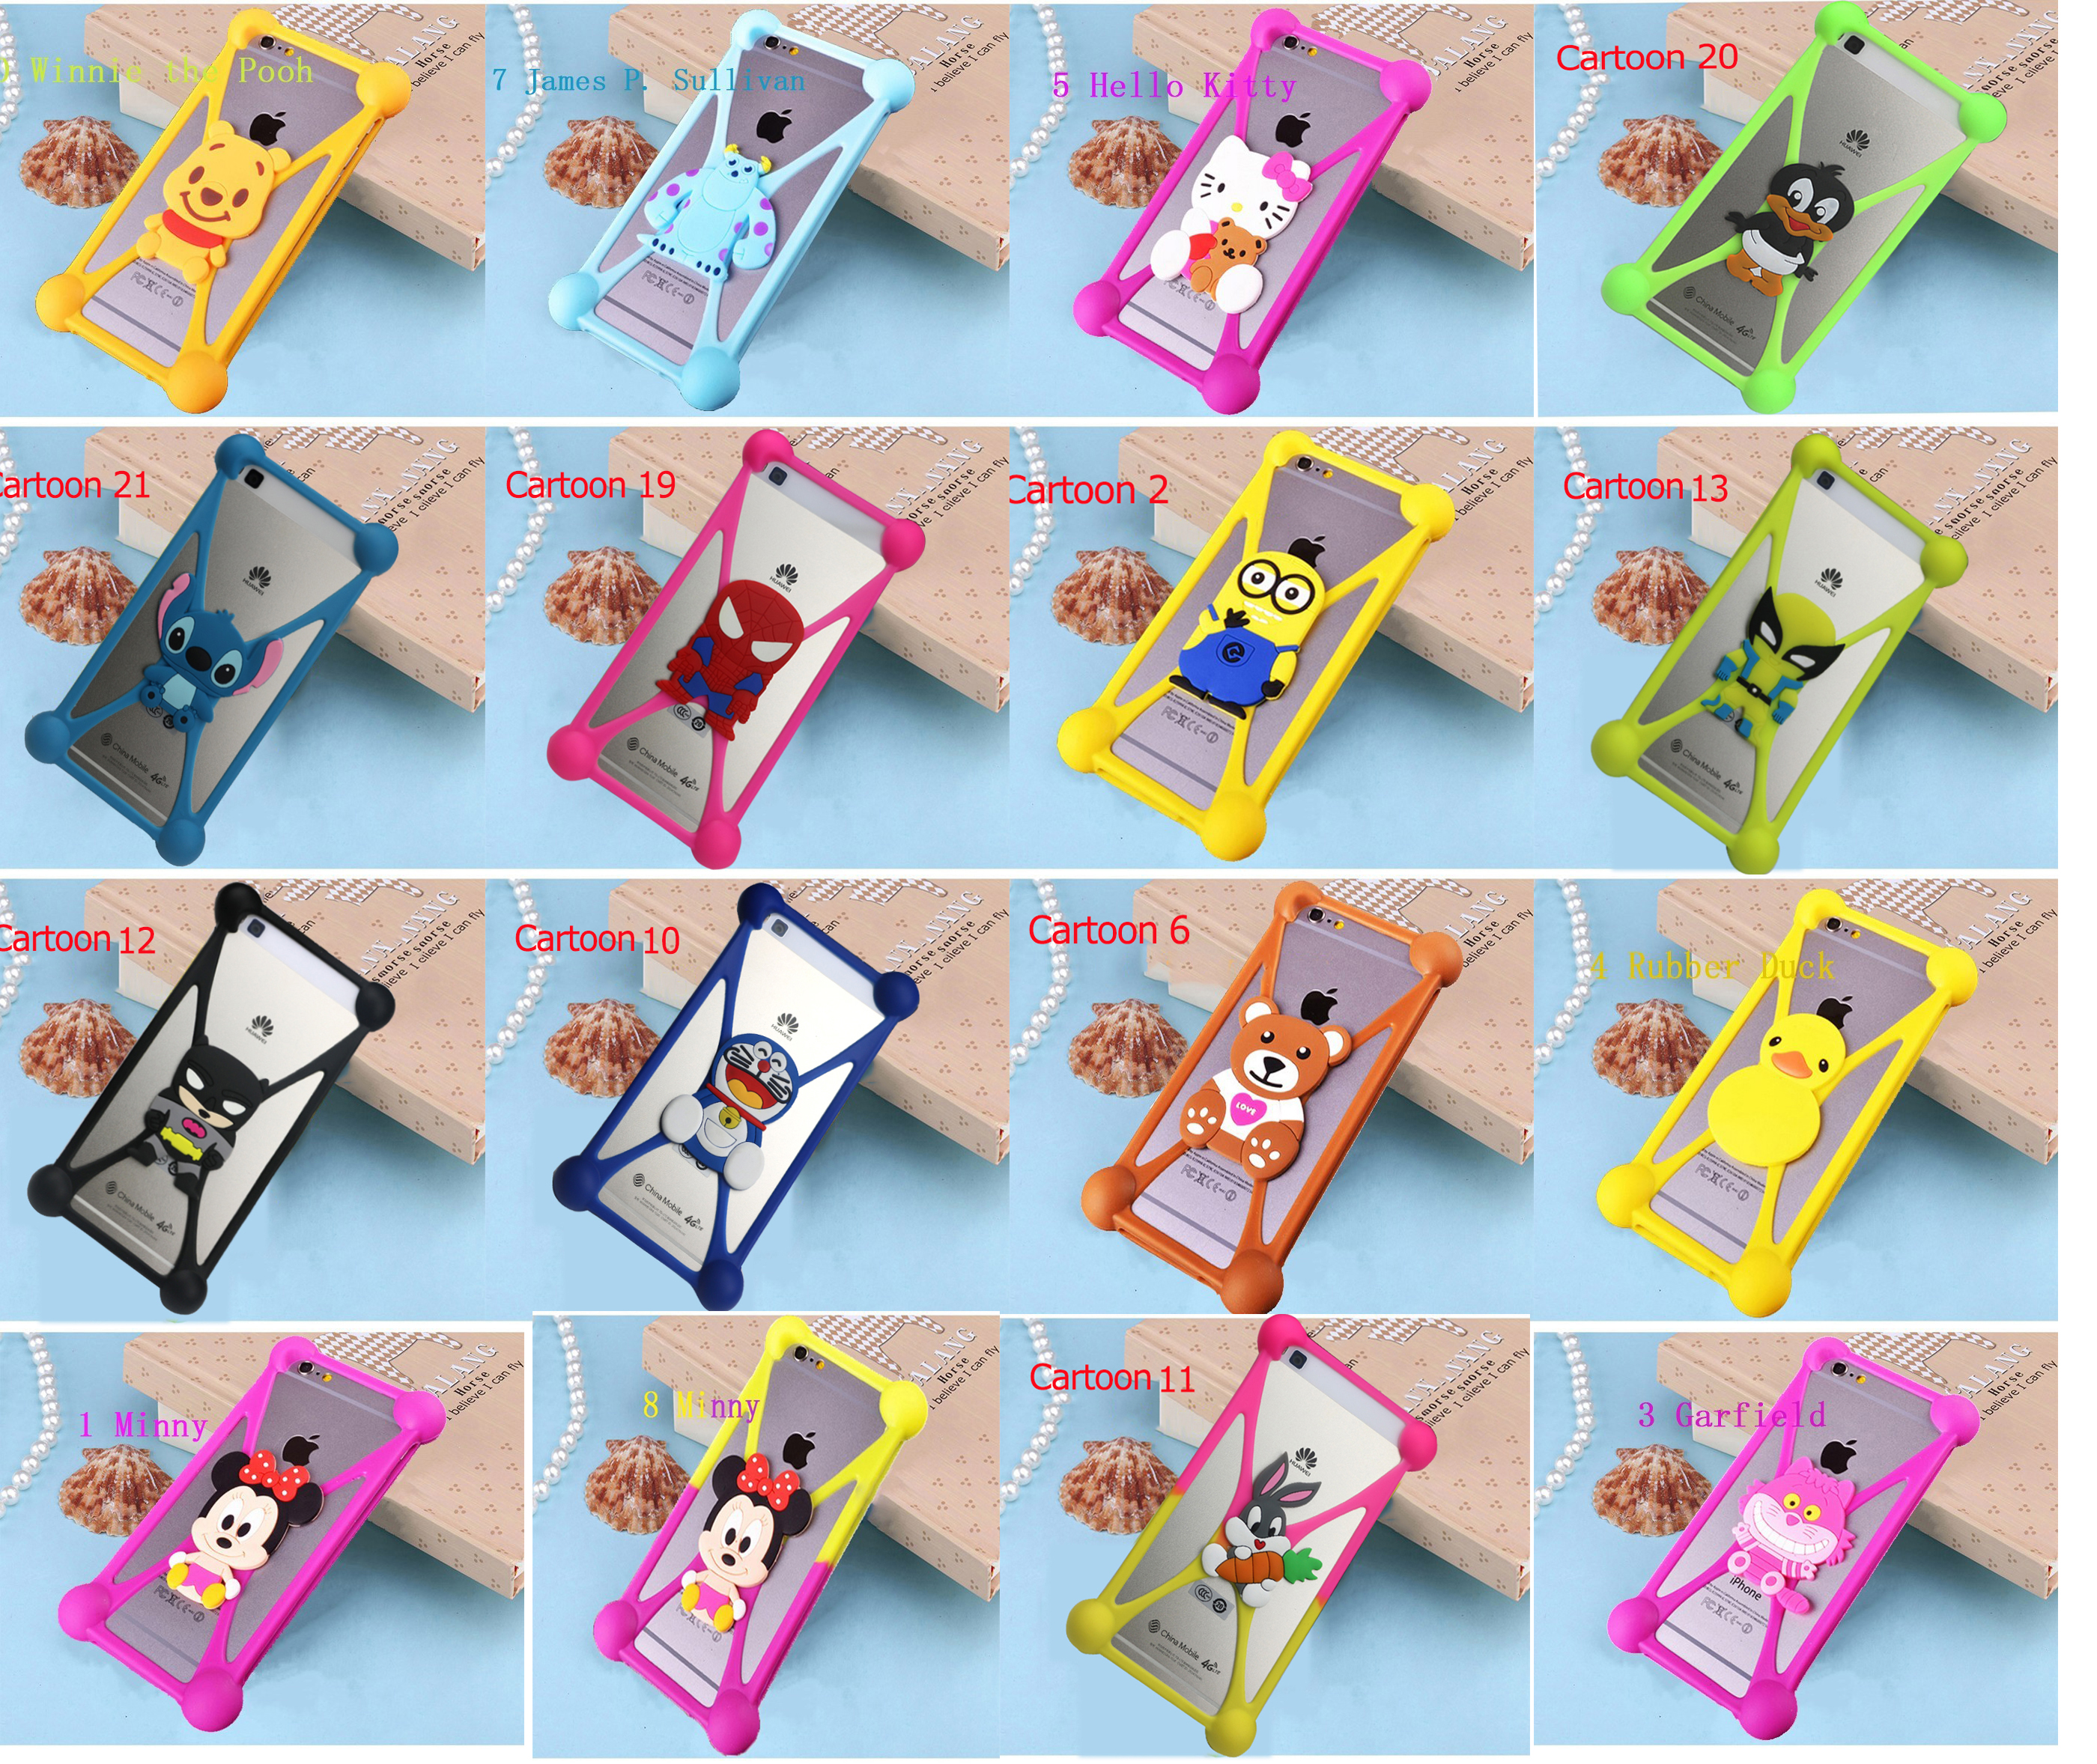 Cute Cartoon Hello Kitty Batman Minnie Minions Stitch Soft Silicon Case Cover For Google Pixel 2 XL For Gretel A6 A7 A9 GT6000